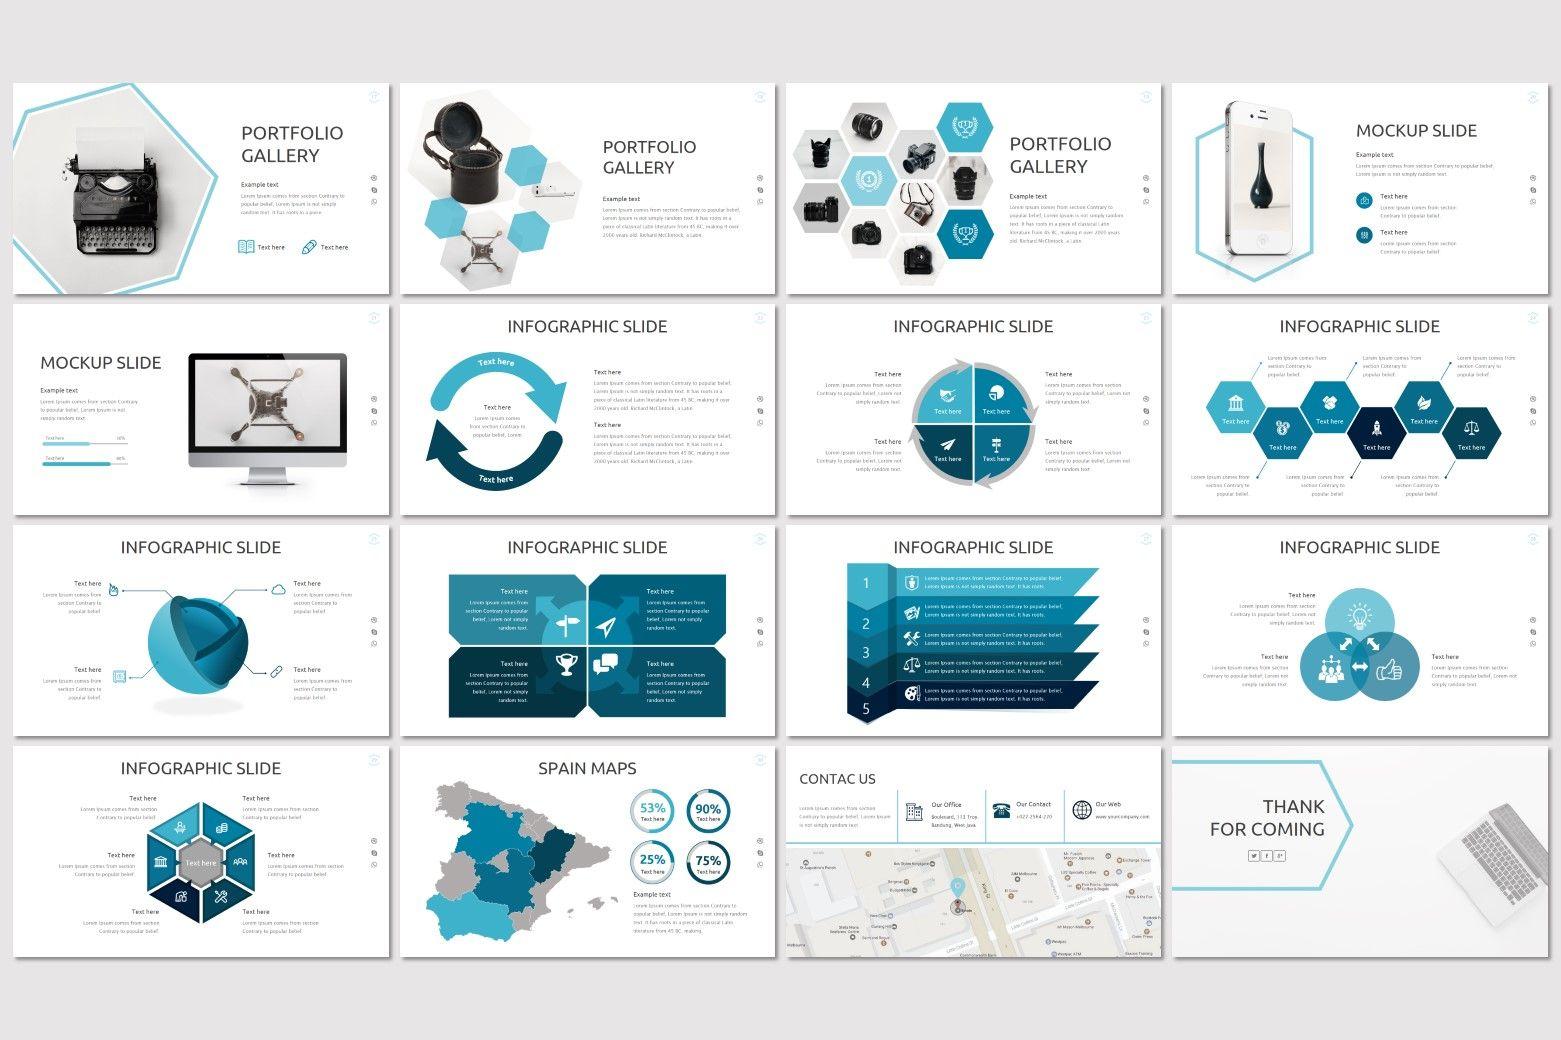 Tabous - PowerPoint Template, Slide 3, 07170, Presentation Templates — PoweredTemplate.com